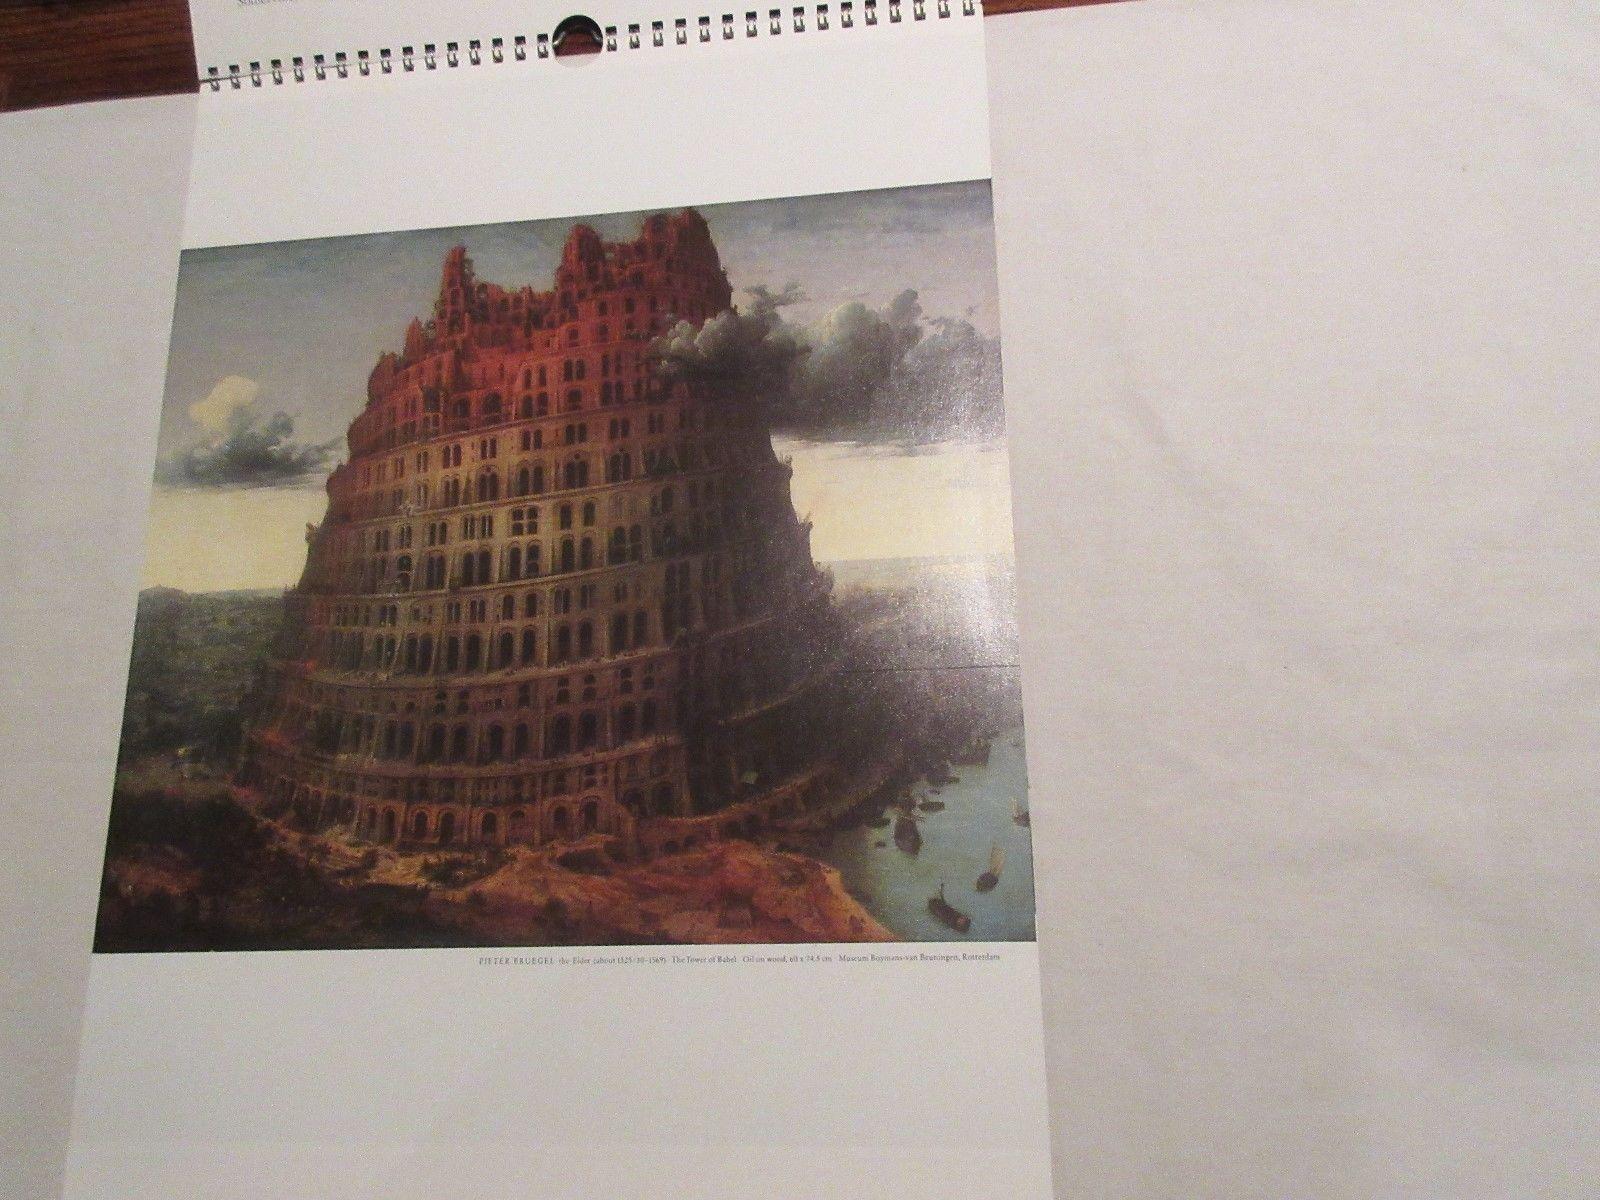 Rx , Pharmacy , Calendar , Hoechst-Roussel Pharmaceuticals Inc.,1987 , Vintage image 2